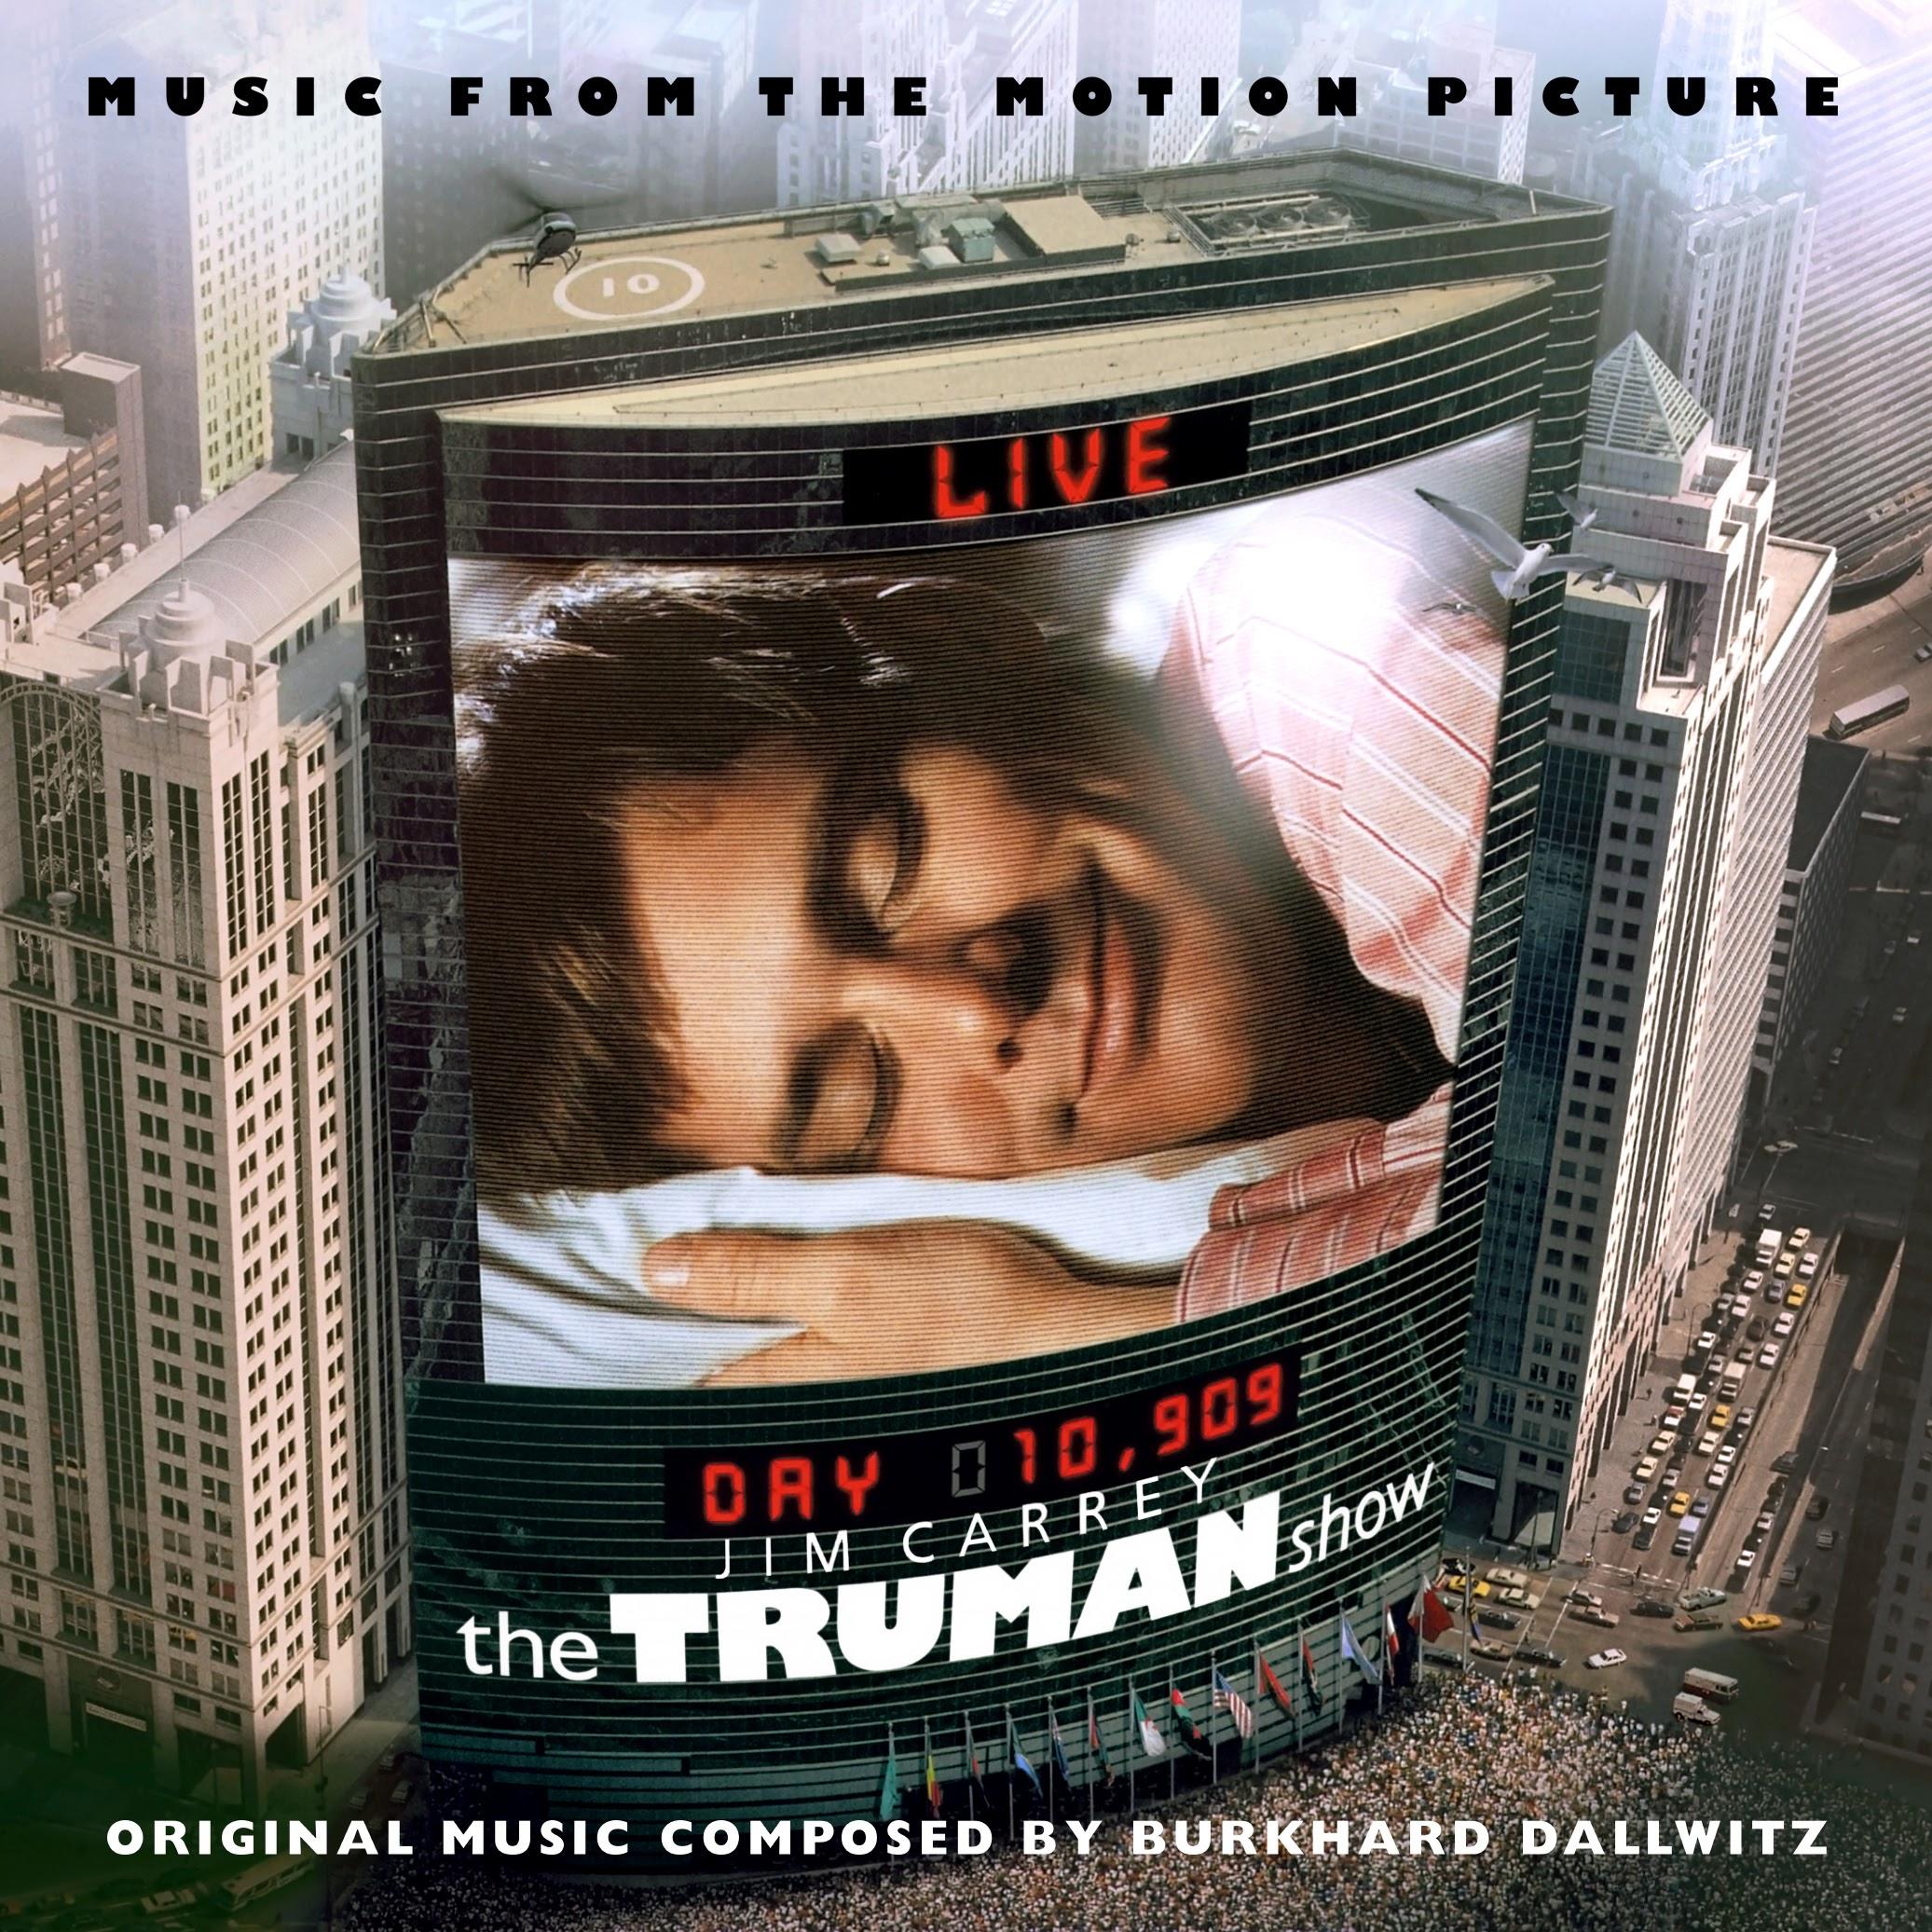 Album Artist: Burkhard Dallwitz / Album Title: The Truman Show (Music from the Motion Picture) [Customized Album Art]